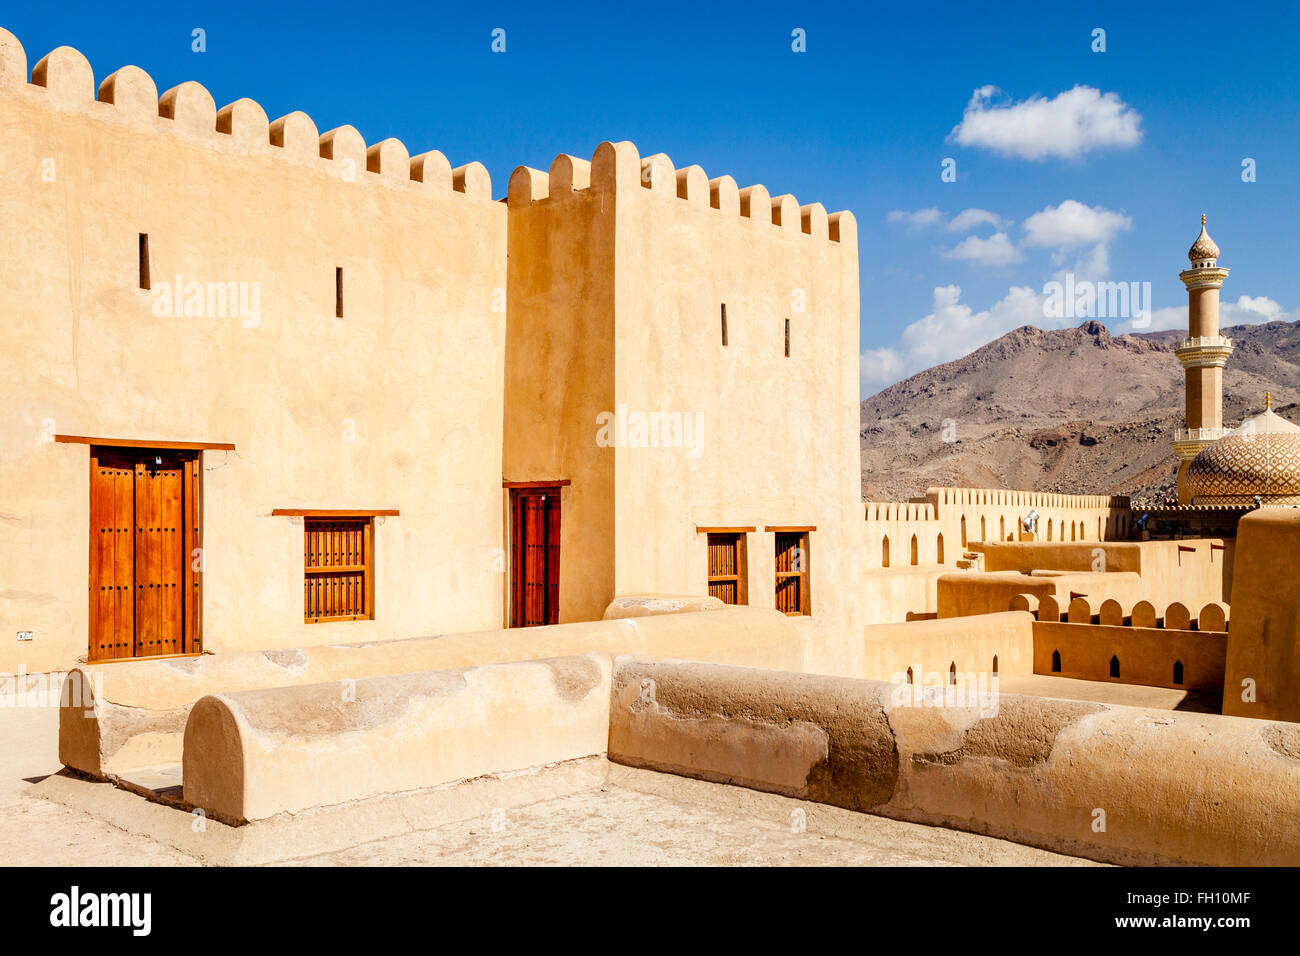 The Nizwa Fort, Nizwa, Ad Dakhiliyah Region, Oman - Stock Image